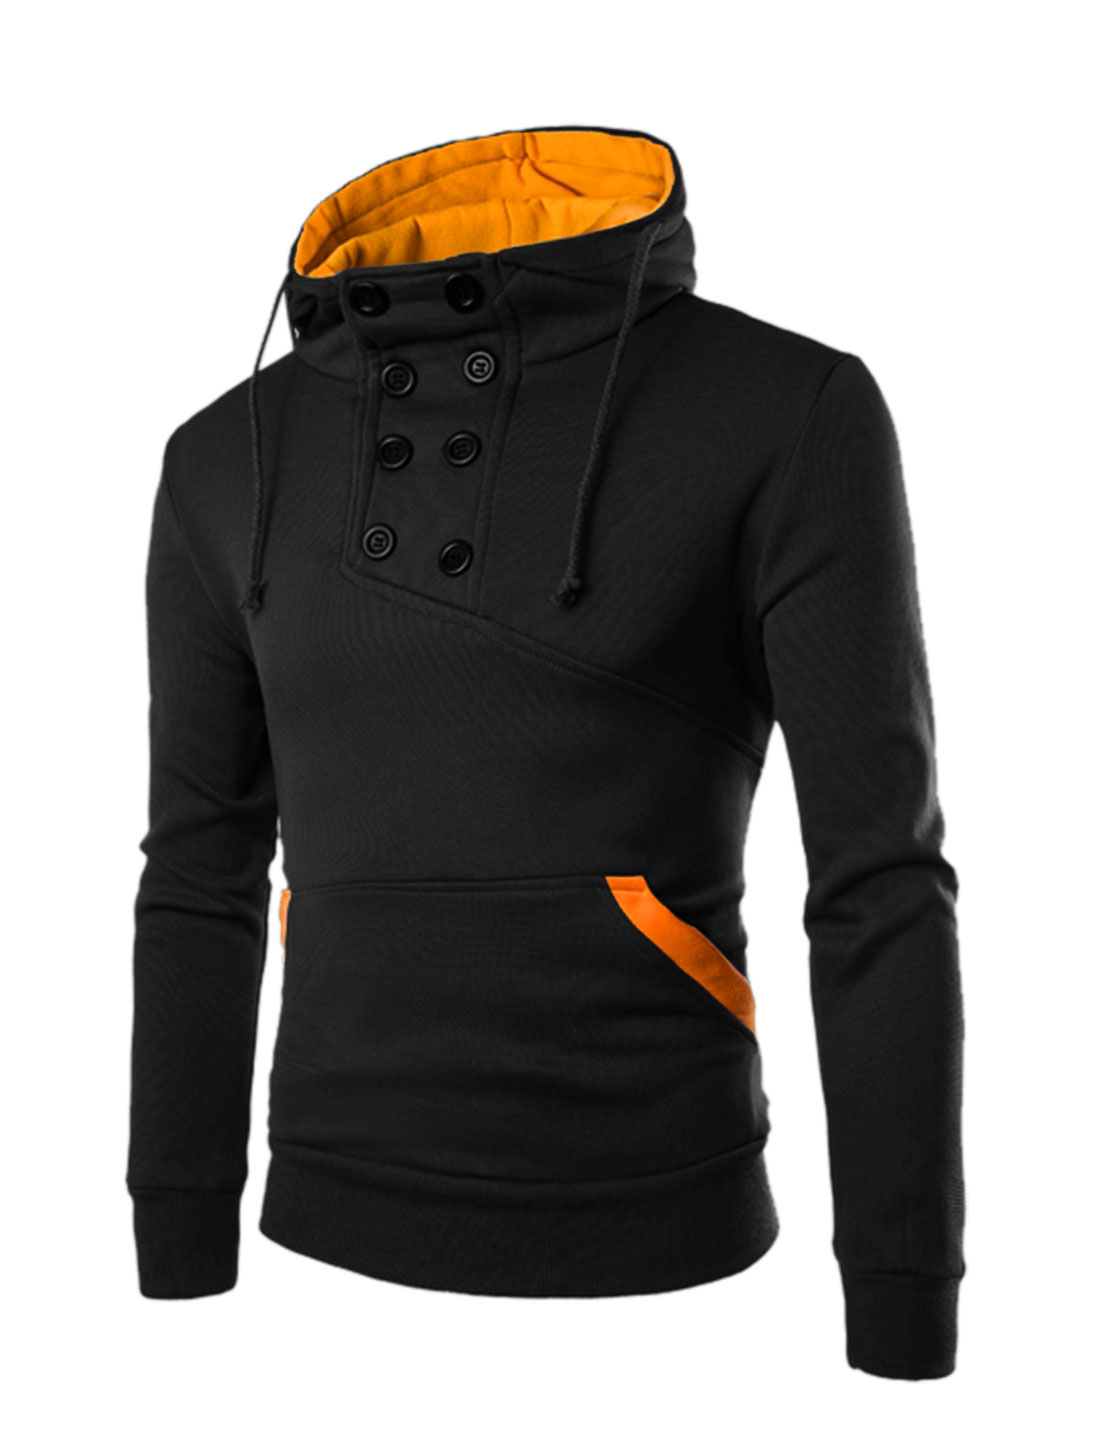 Men Buttons Decor Upper Kangaroo Pocket Front Drawstring Hoodie Black M